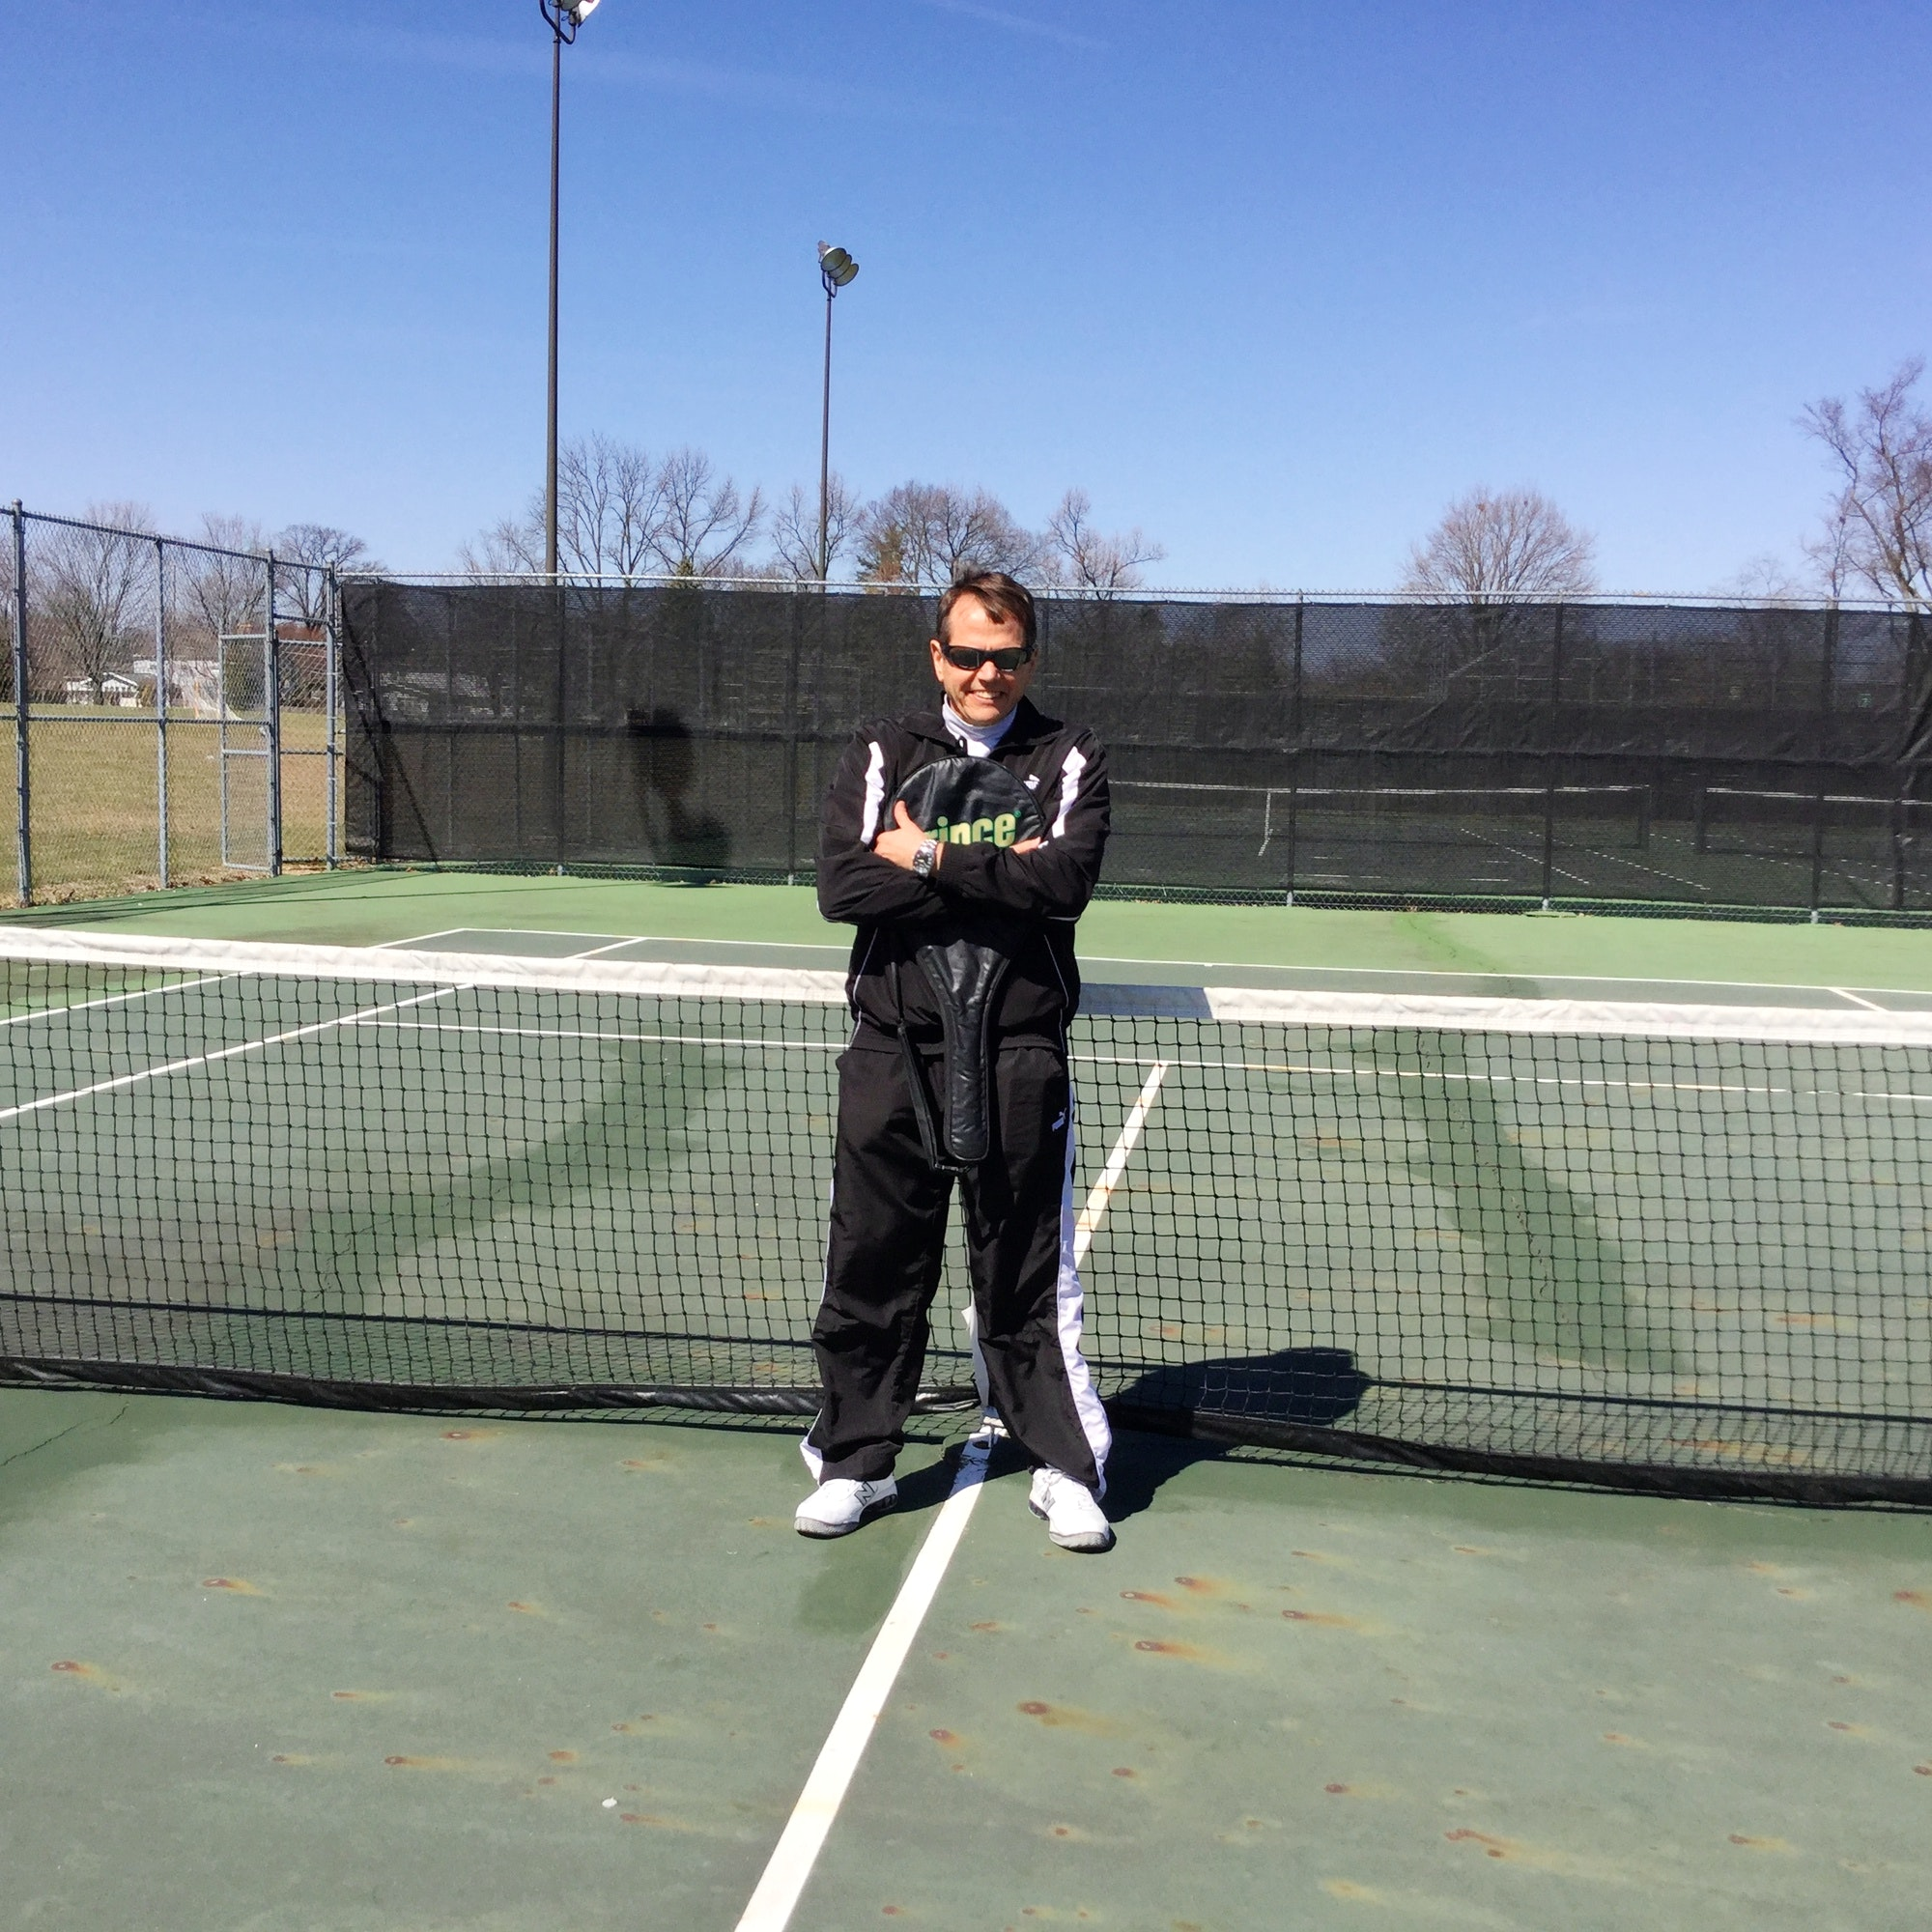 Jon G. teaches tennis lessons in Columbus, OH